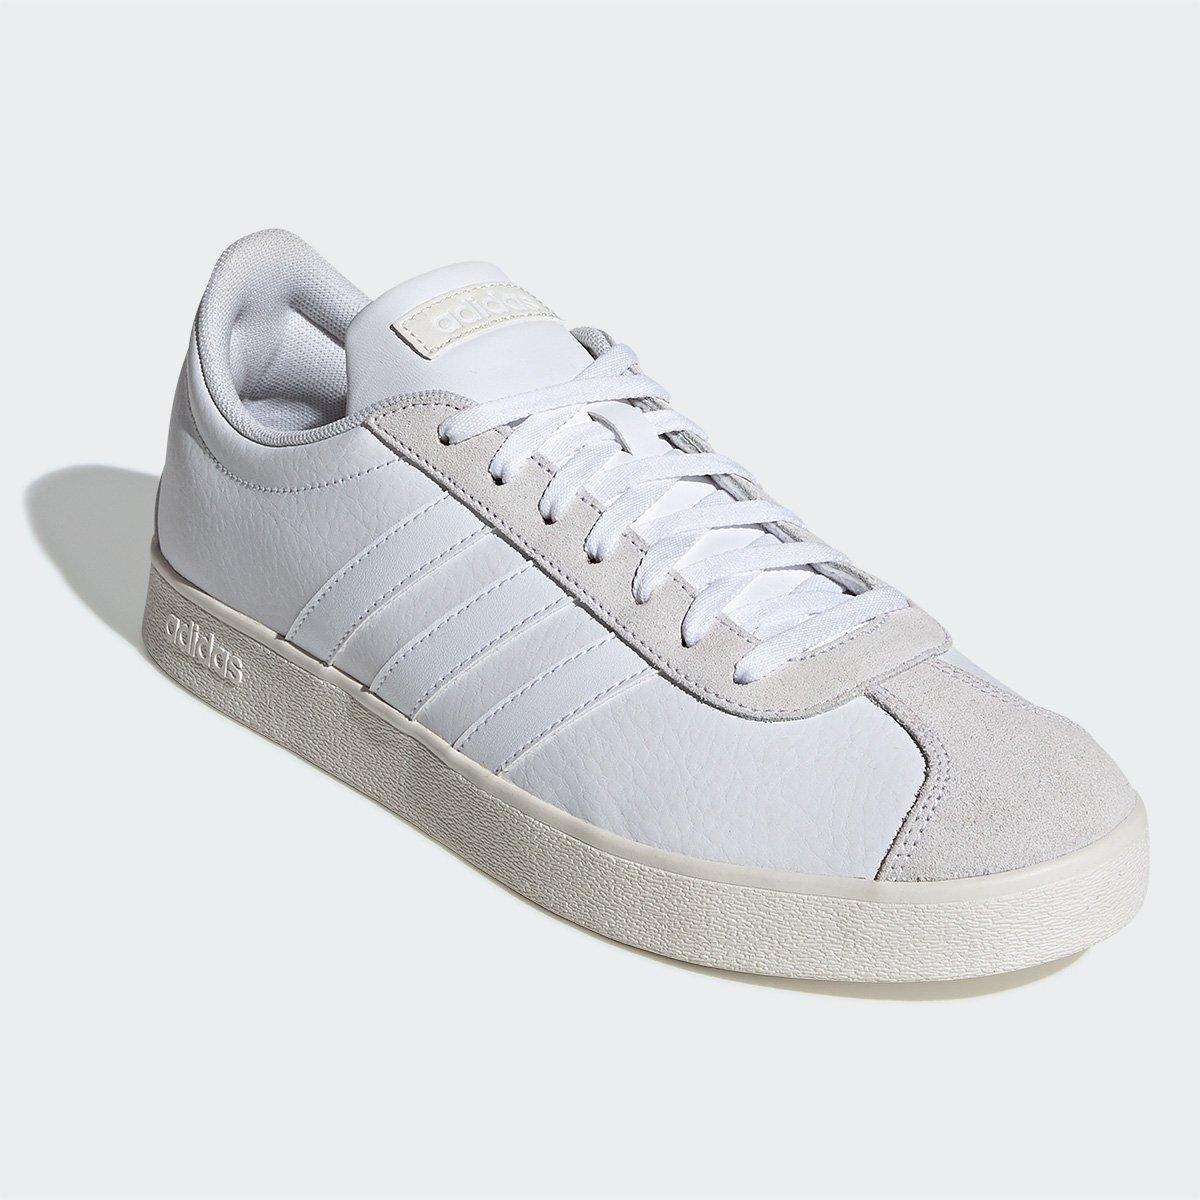 74d782be01a3e FornecedorNetshoes. Tênis Adidas Vl Court 20 Masculino